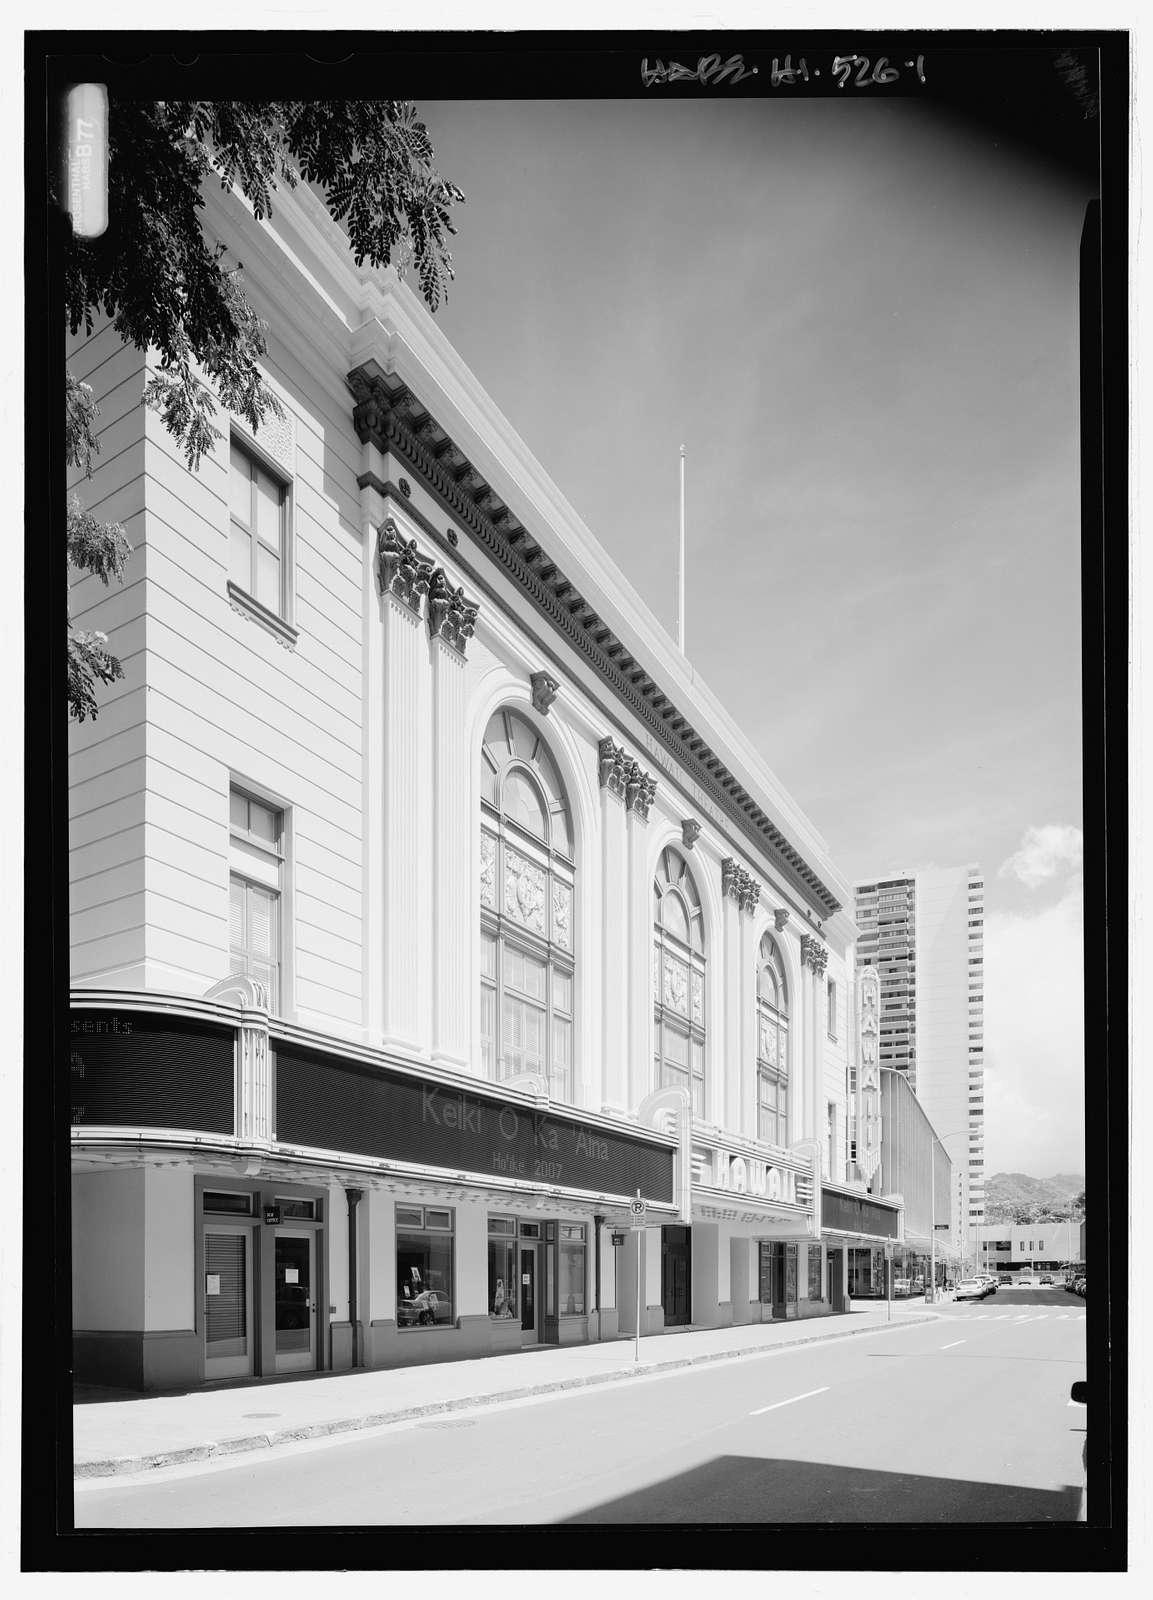 Hawaii Theatre, 1130 Bethel Street, Honolulu, Honolulu County, HI